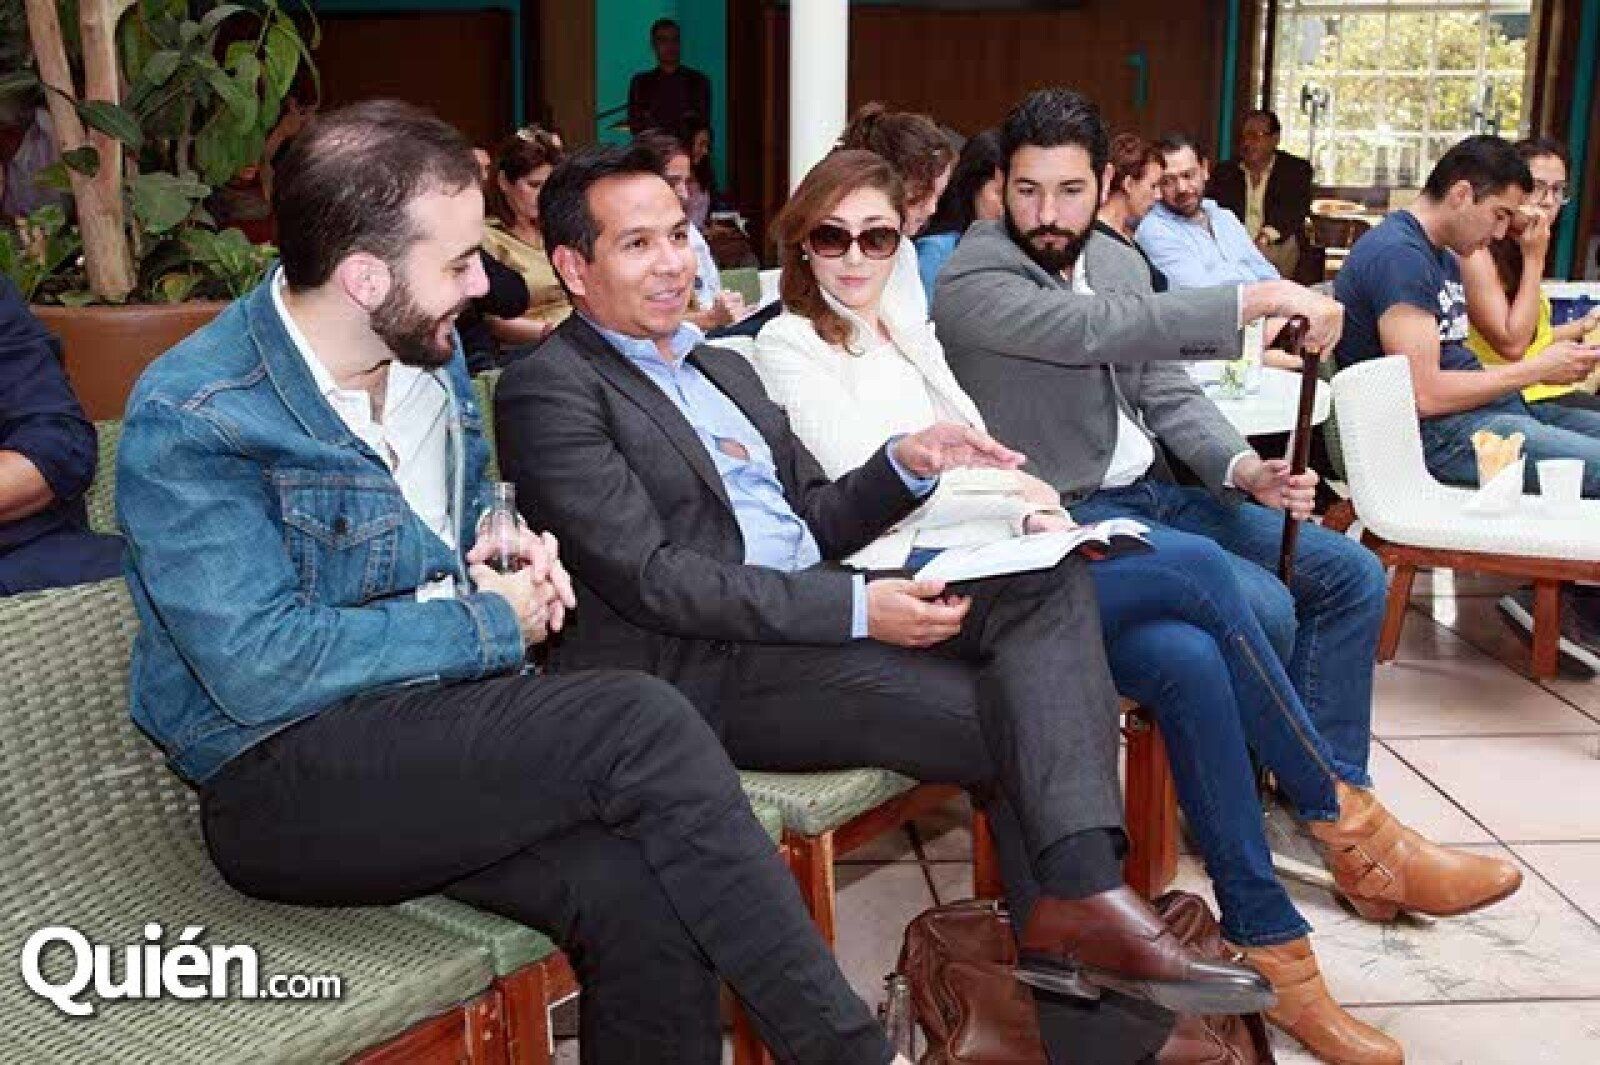 Marco Villa,Francisco Díaz,Zaira Marino y Francisco Zubia